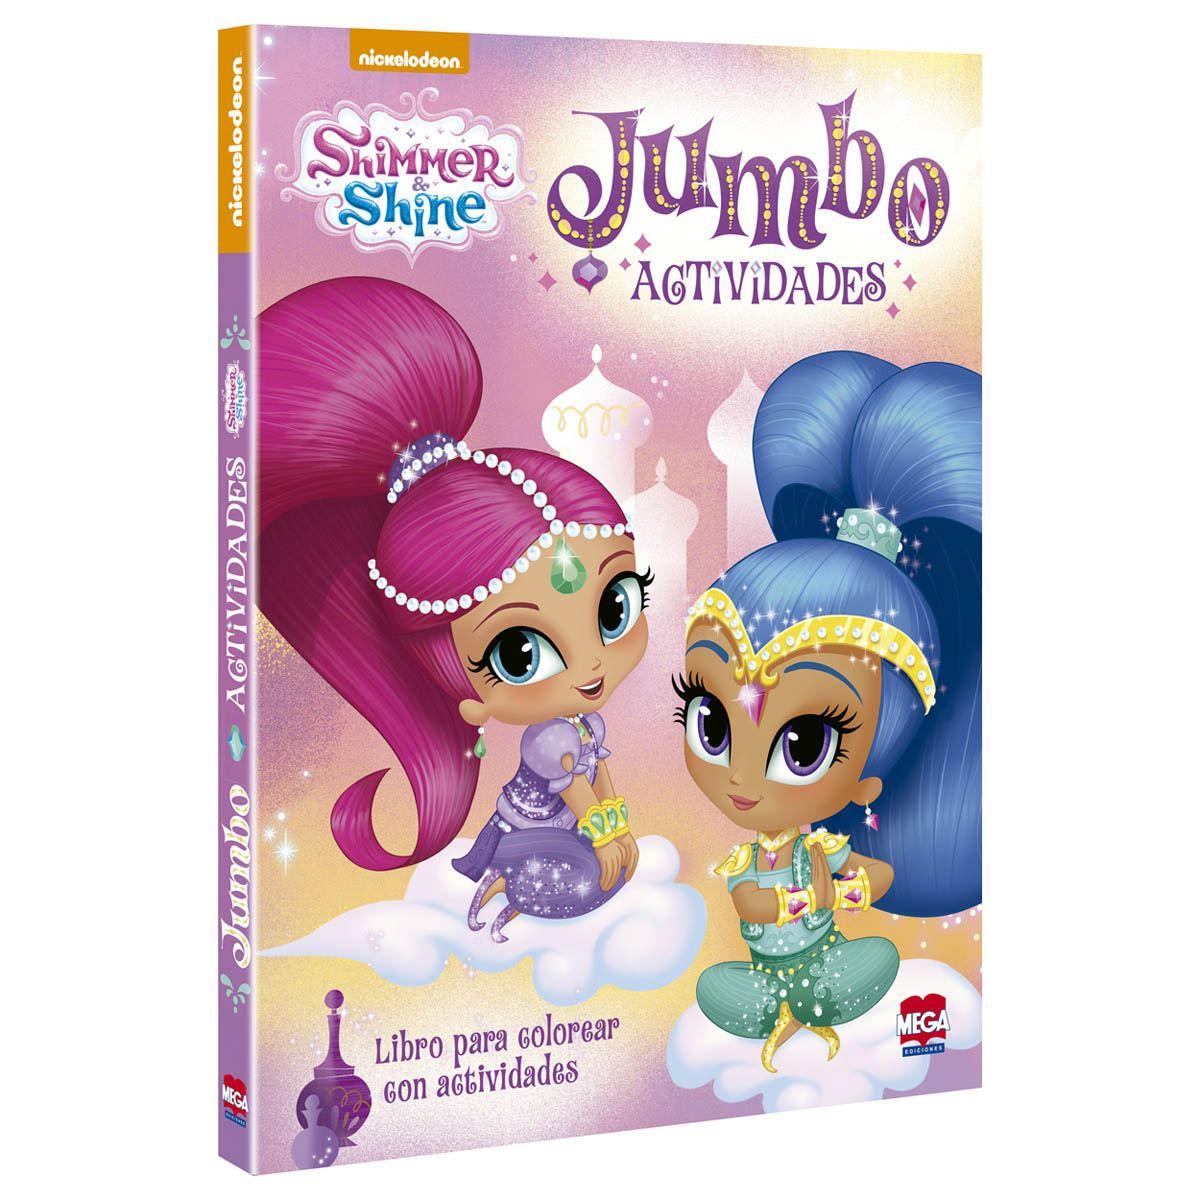 Shimmer & Shine jumbo